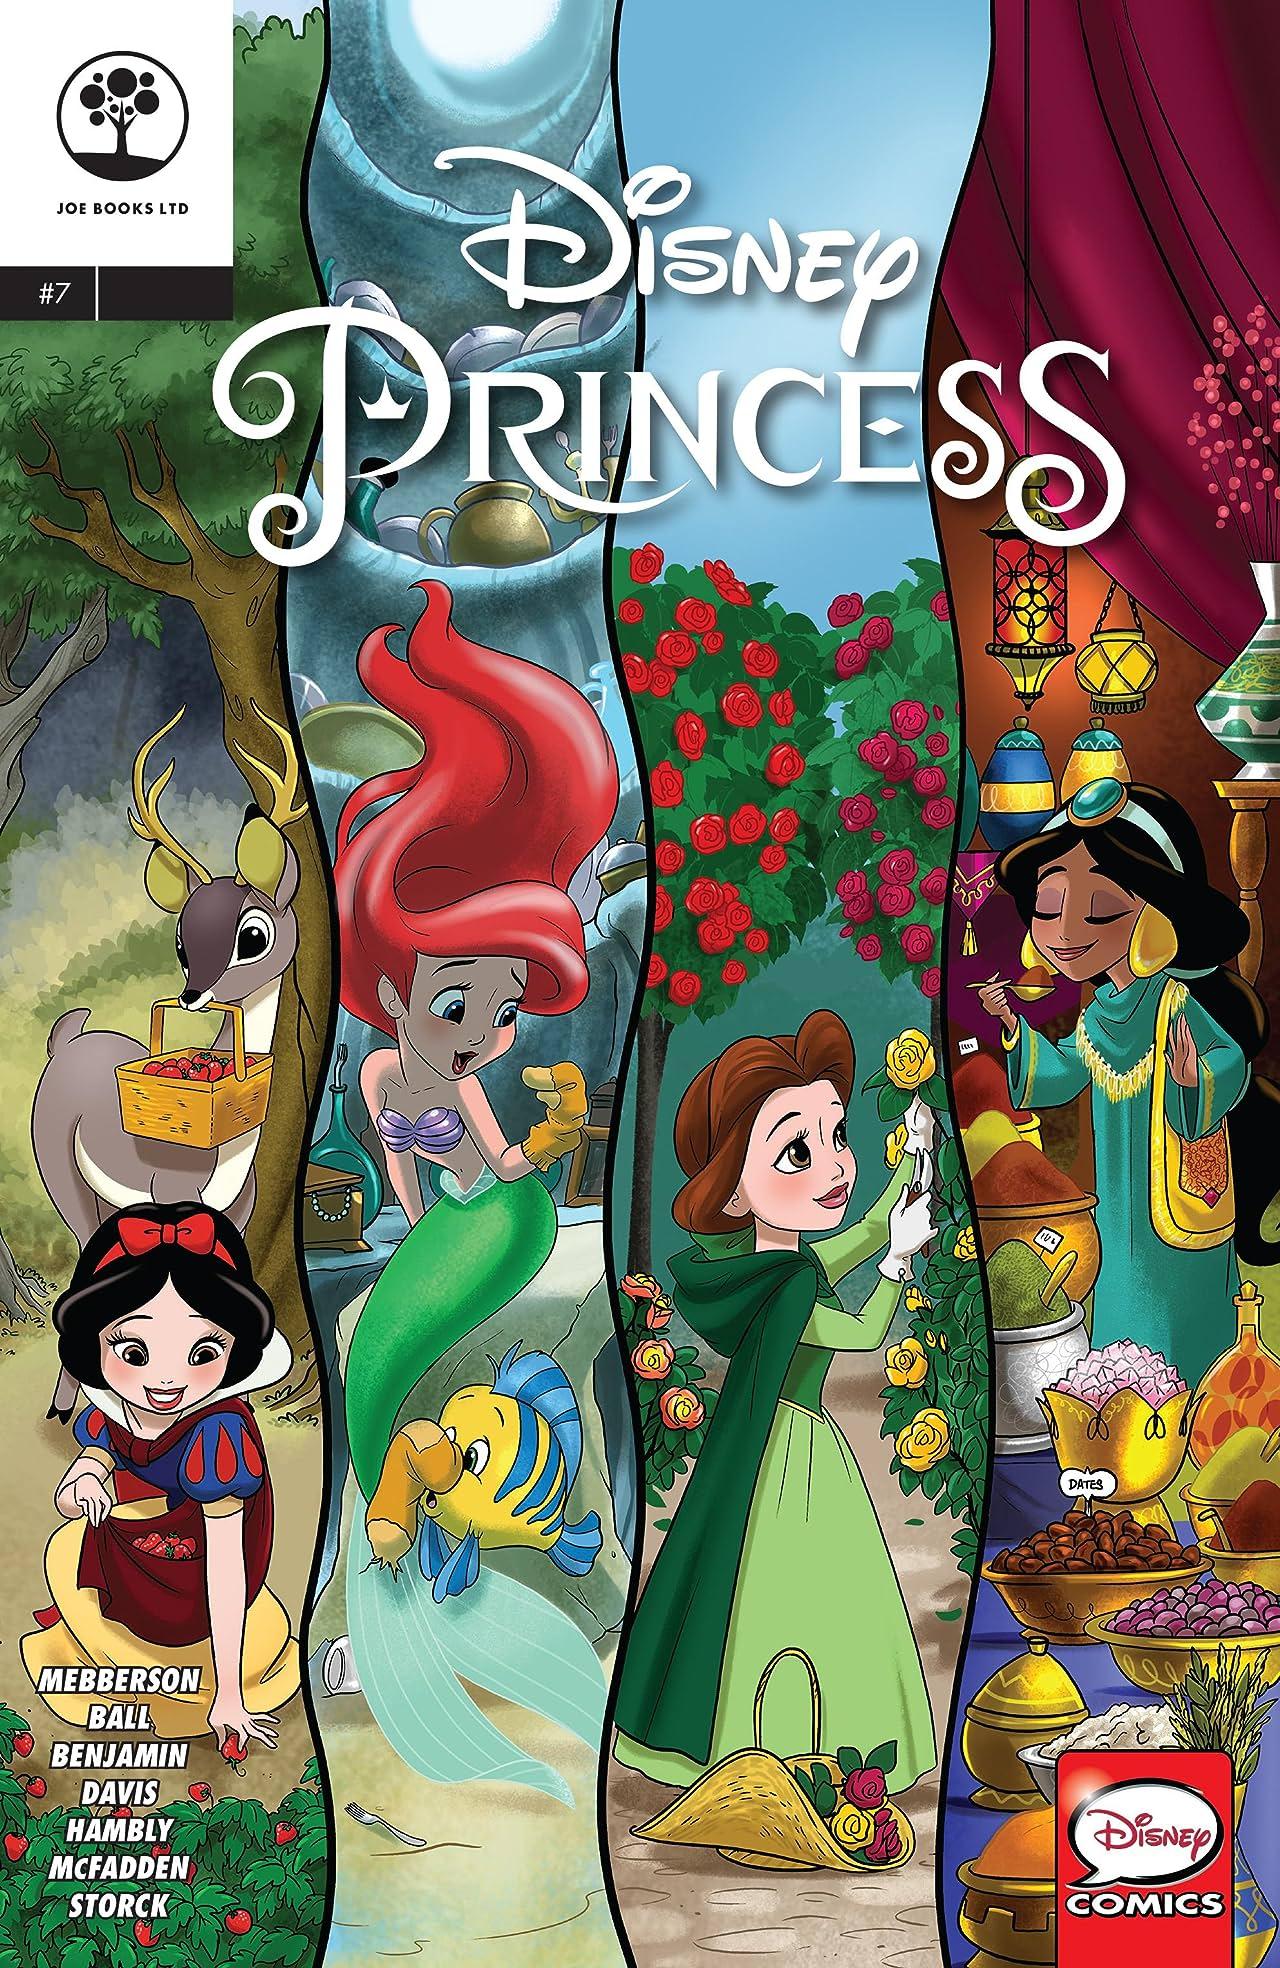 Disney Princess #7